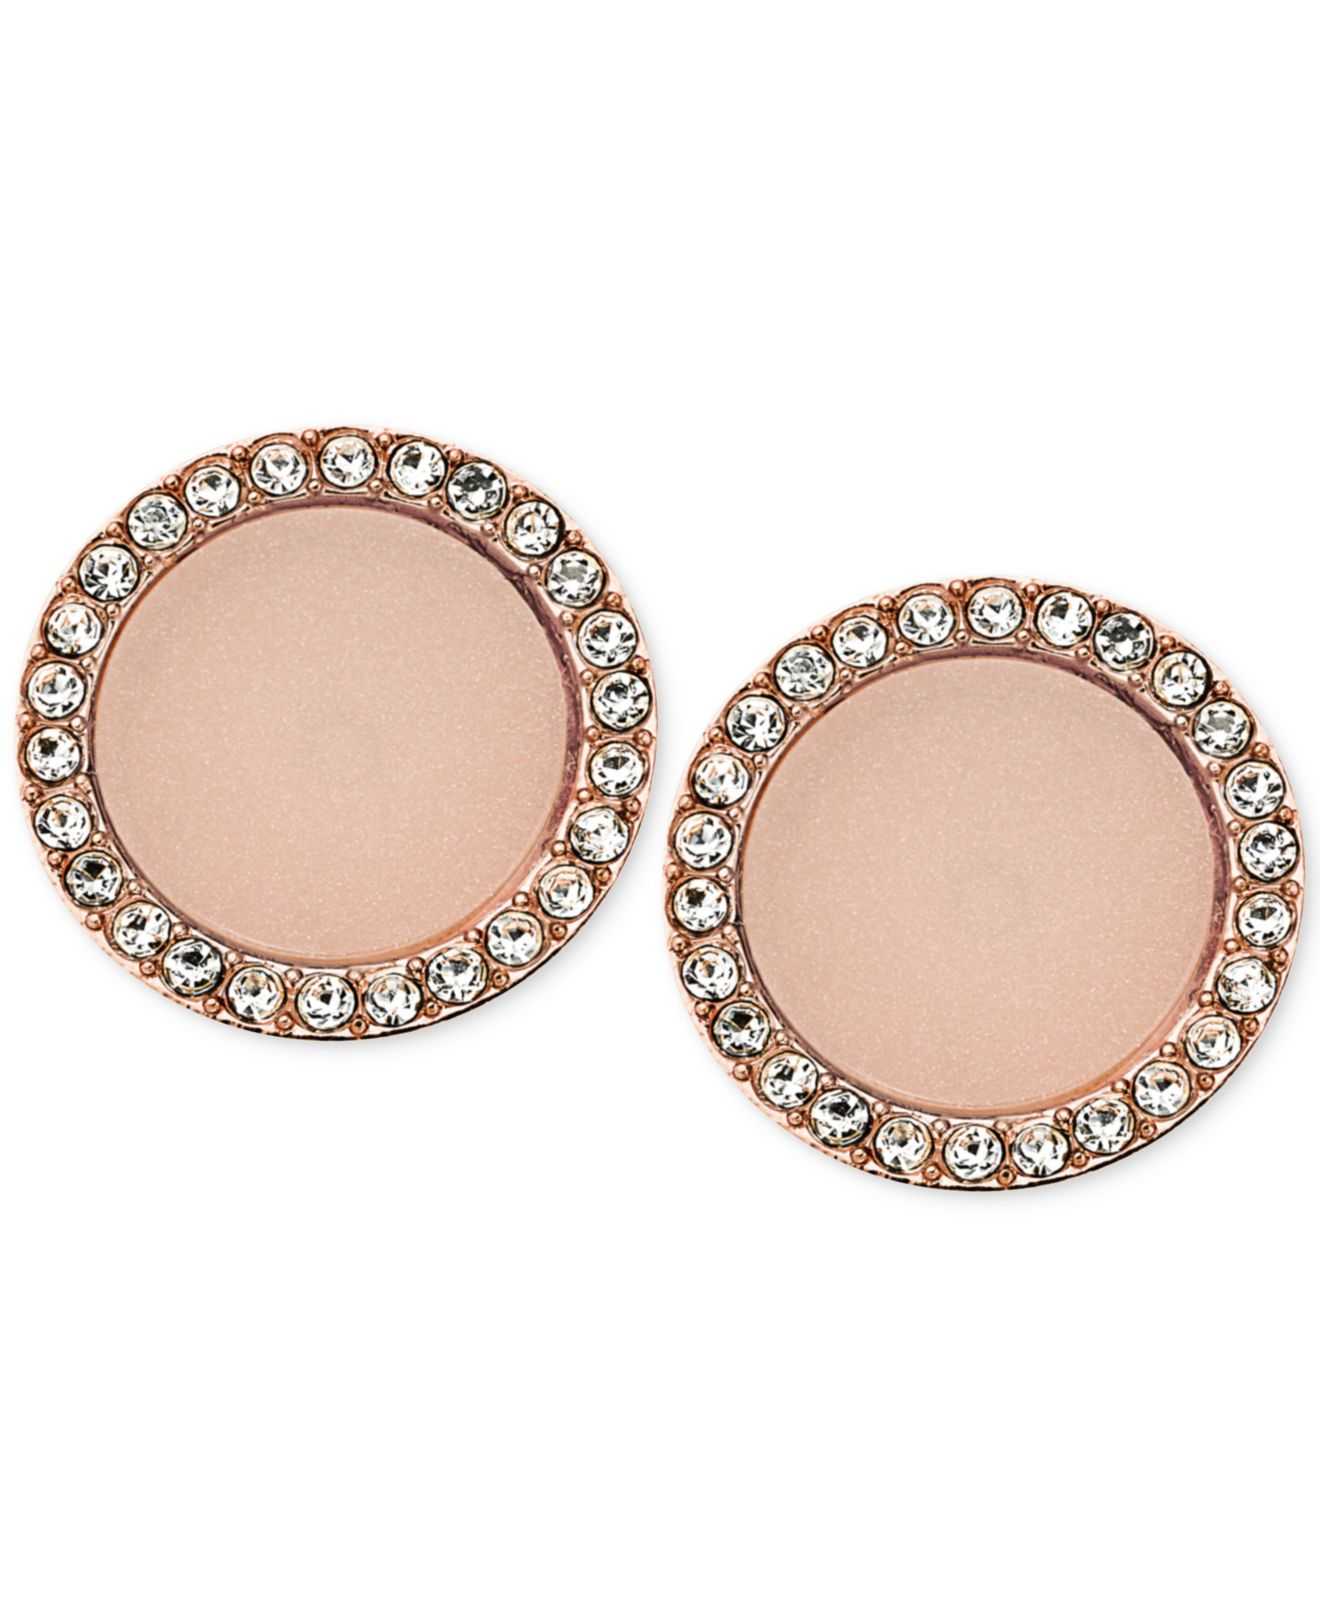 lyst michael kors rose gold tone disc stud earrings in pink. Black Bedroom Furniture Sets. Home Design Ideas